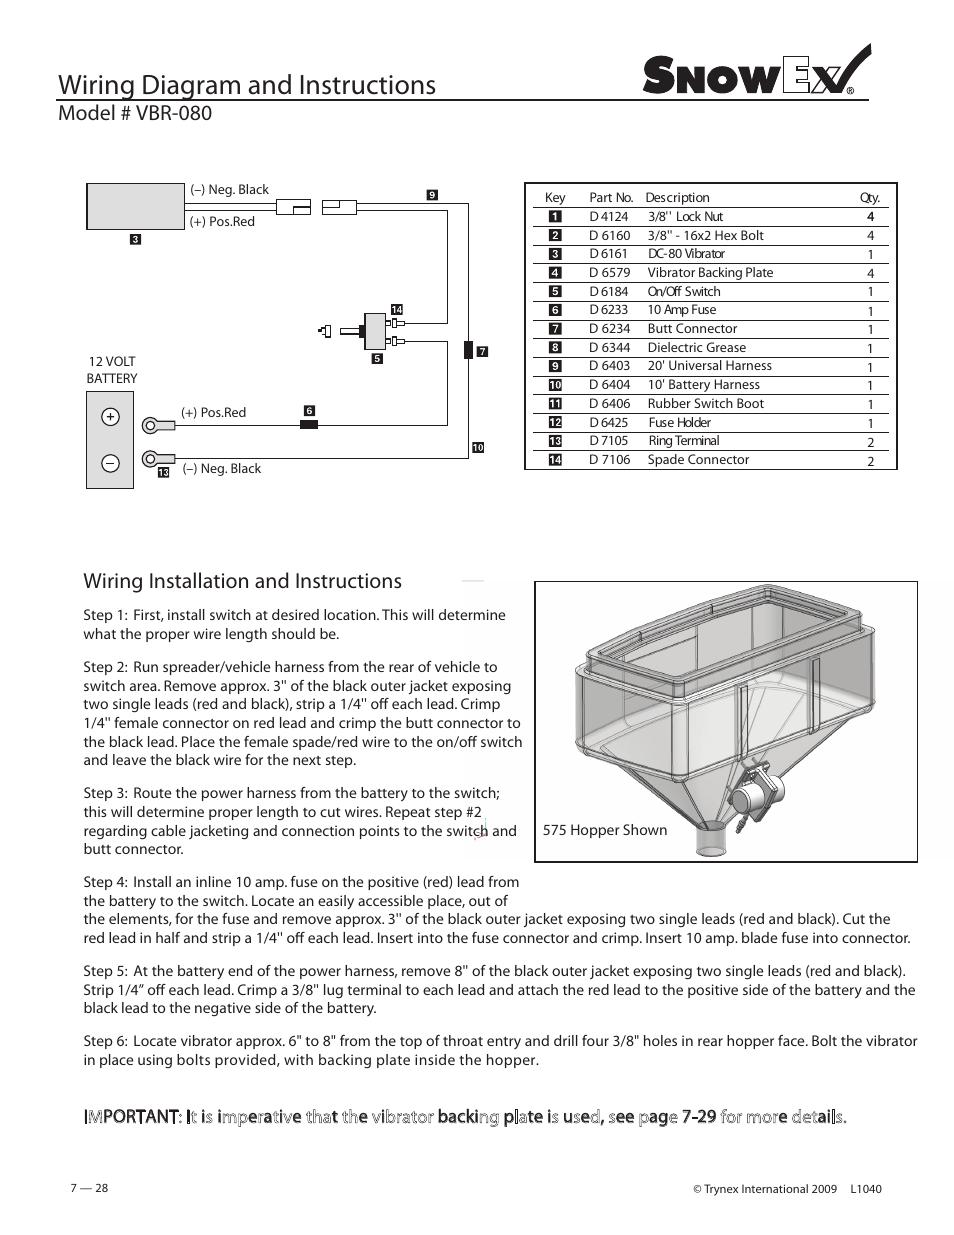 medium resolution of wiring diagram and instructions model vbr 080 wiring snowex wiring diagram 2500